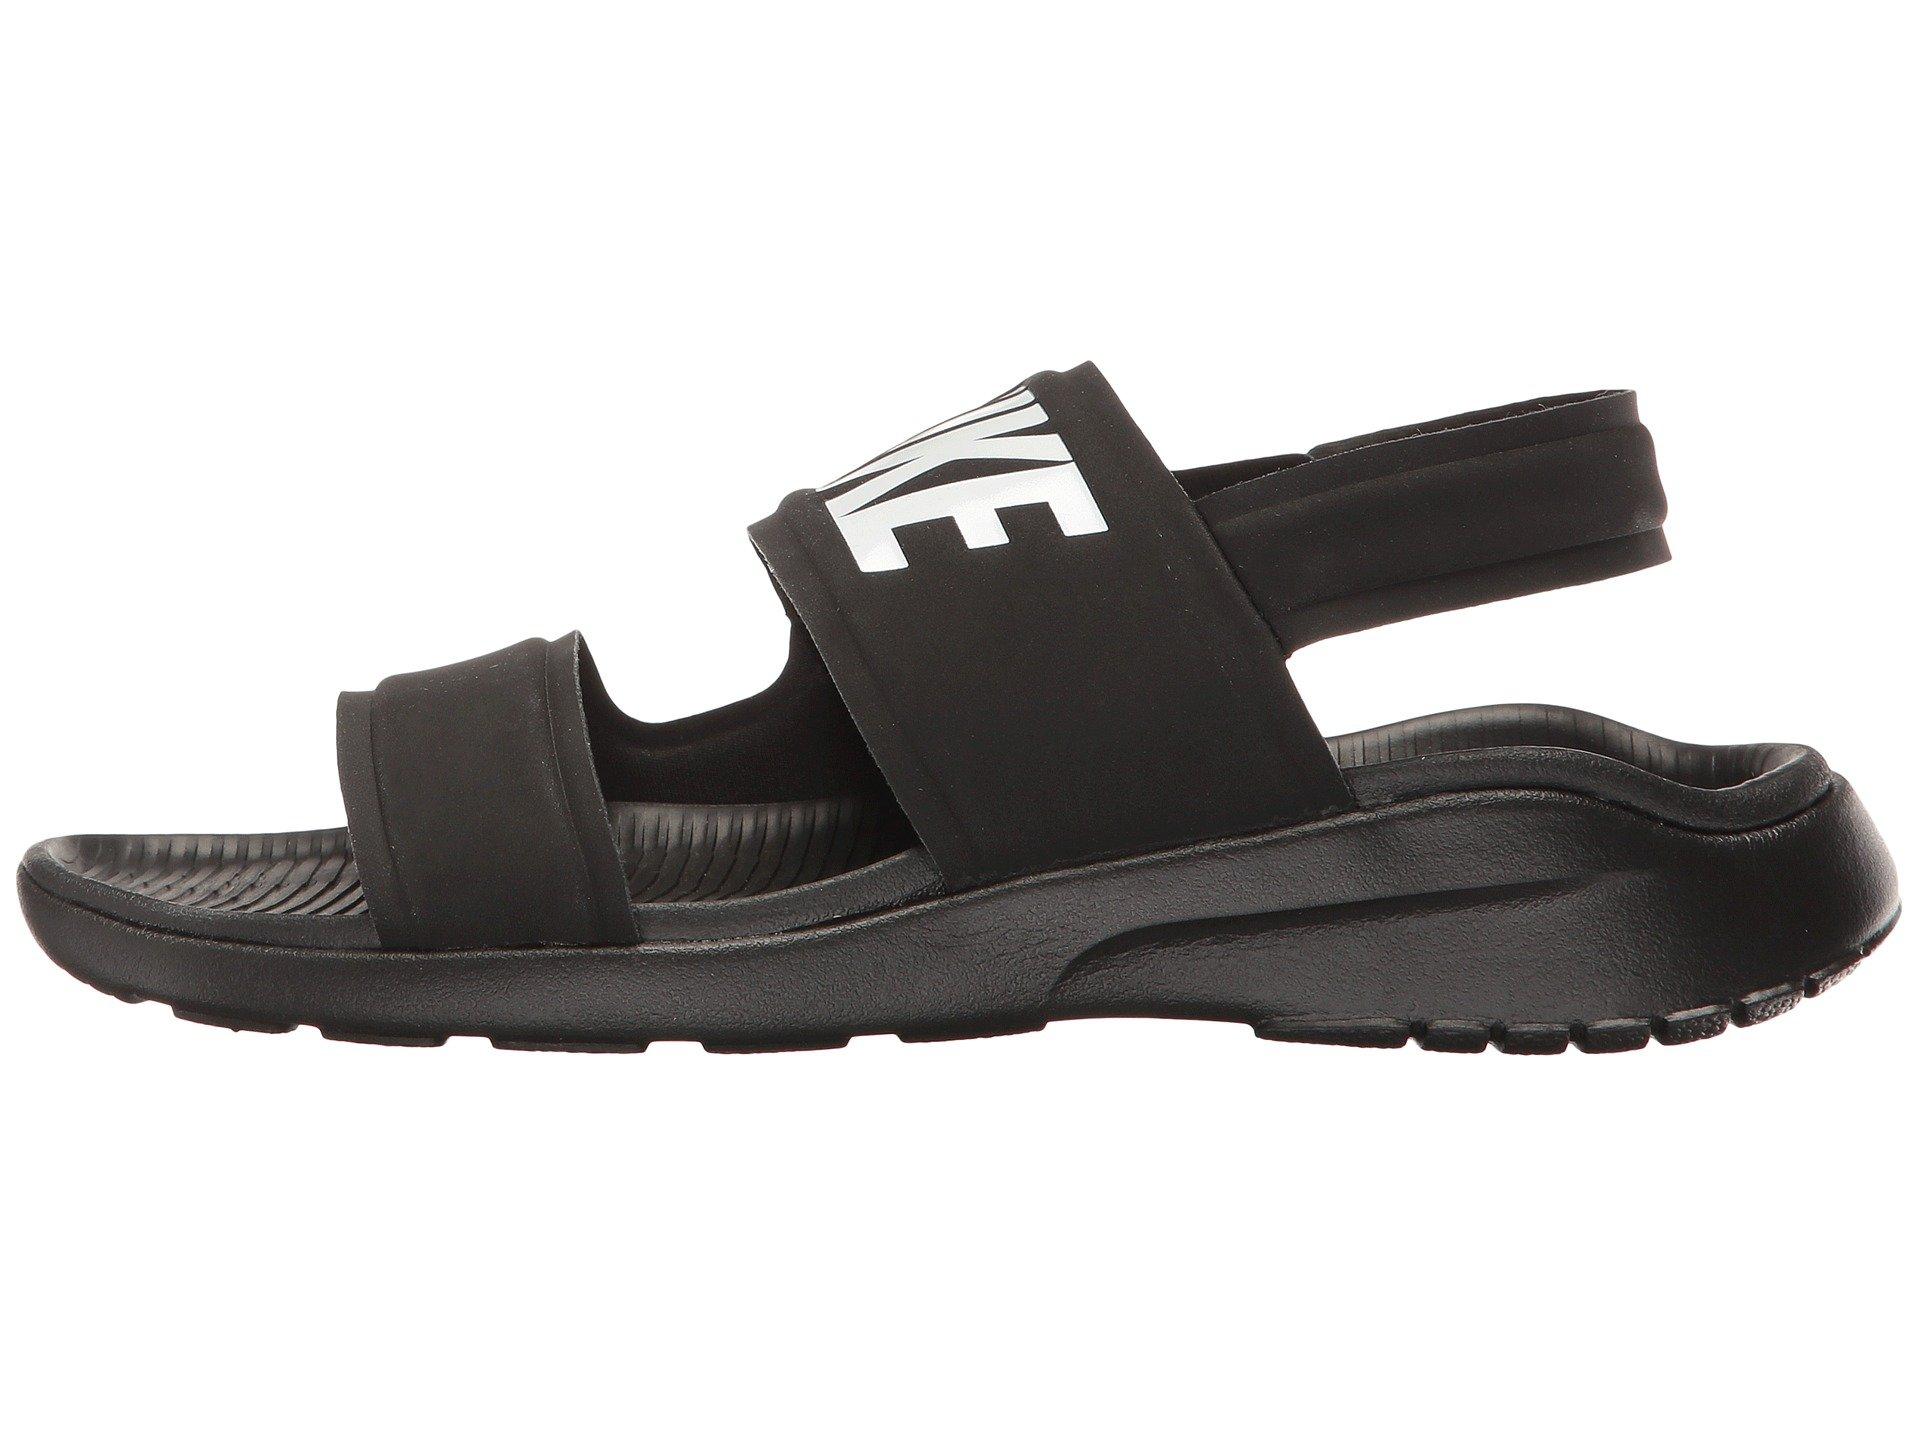 Nike Tanjun Sandal At Zappos Com